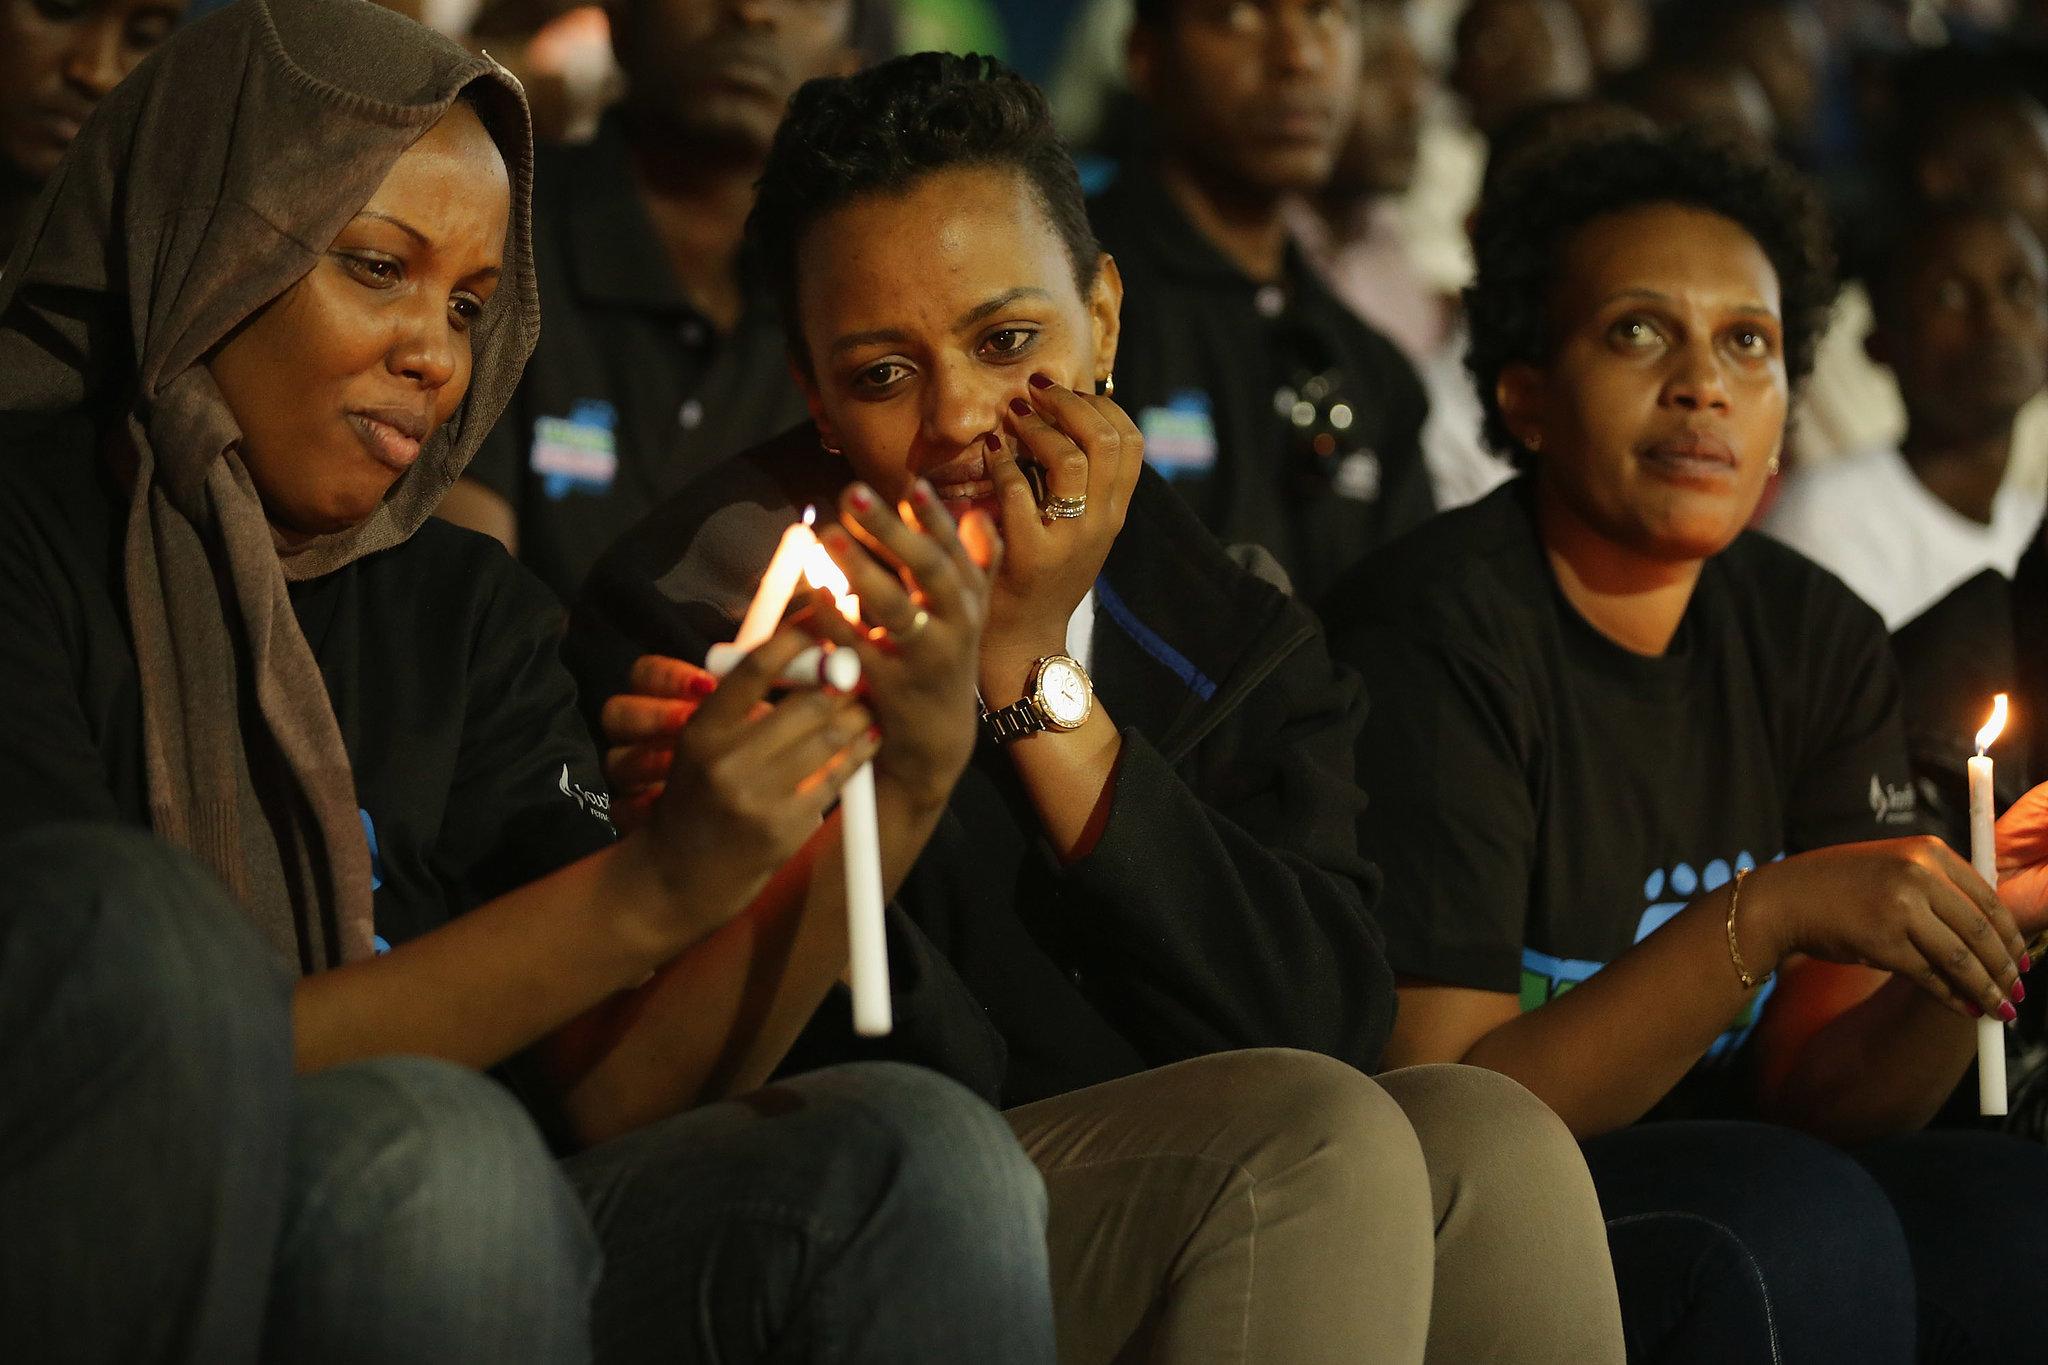 Rwandans took part in today's candlelight vigil at Amahoro Stadium.